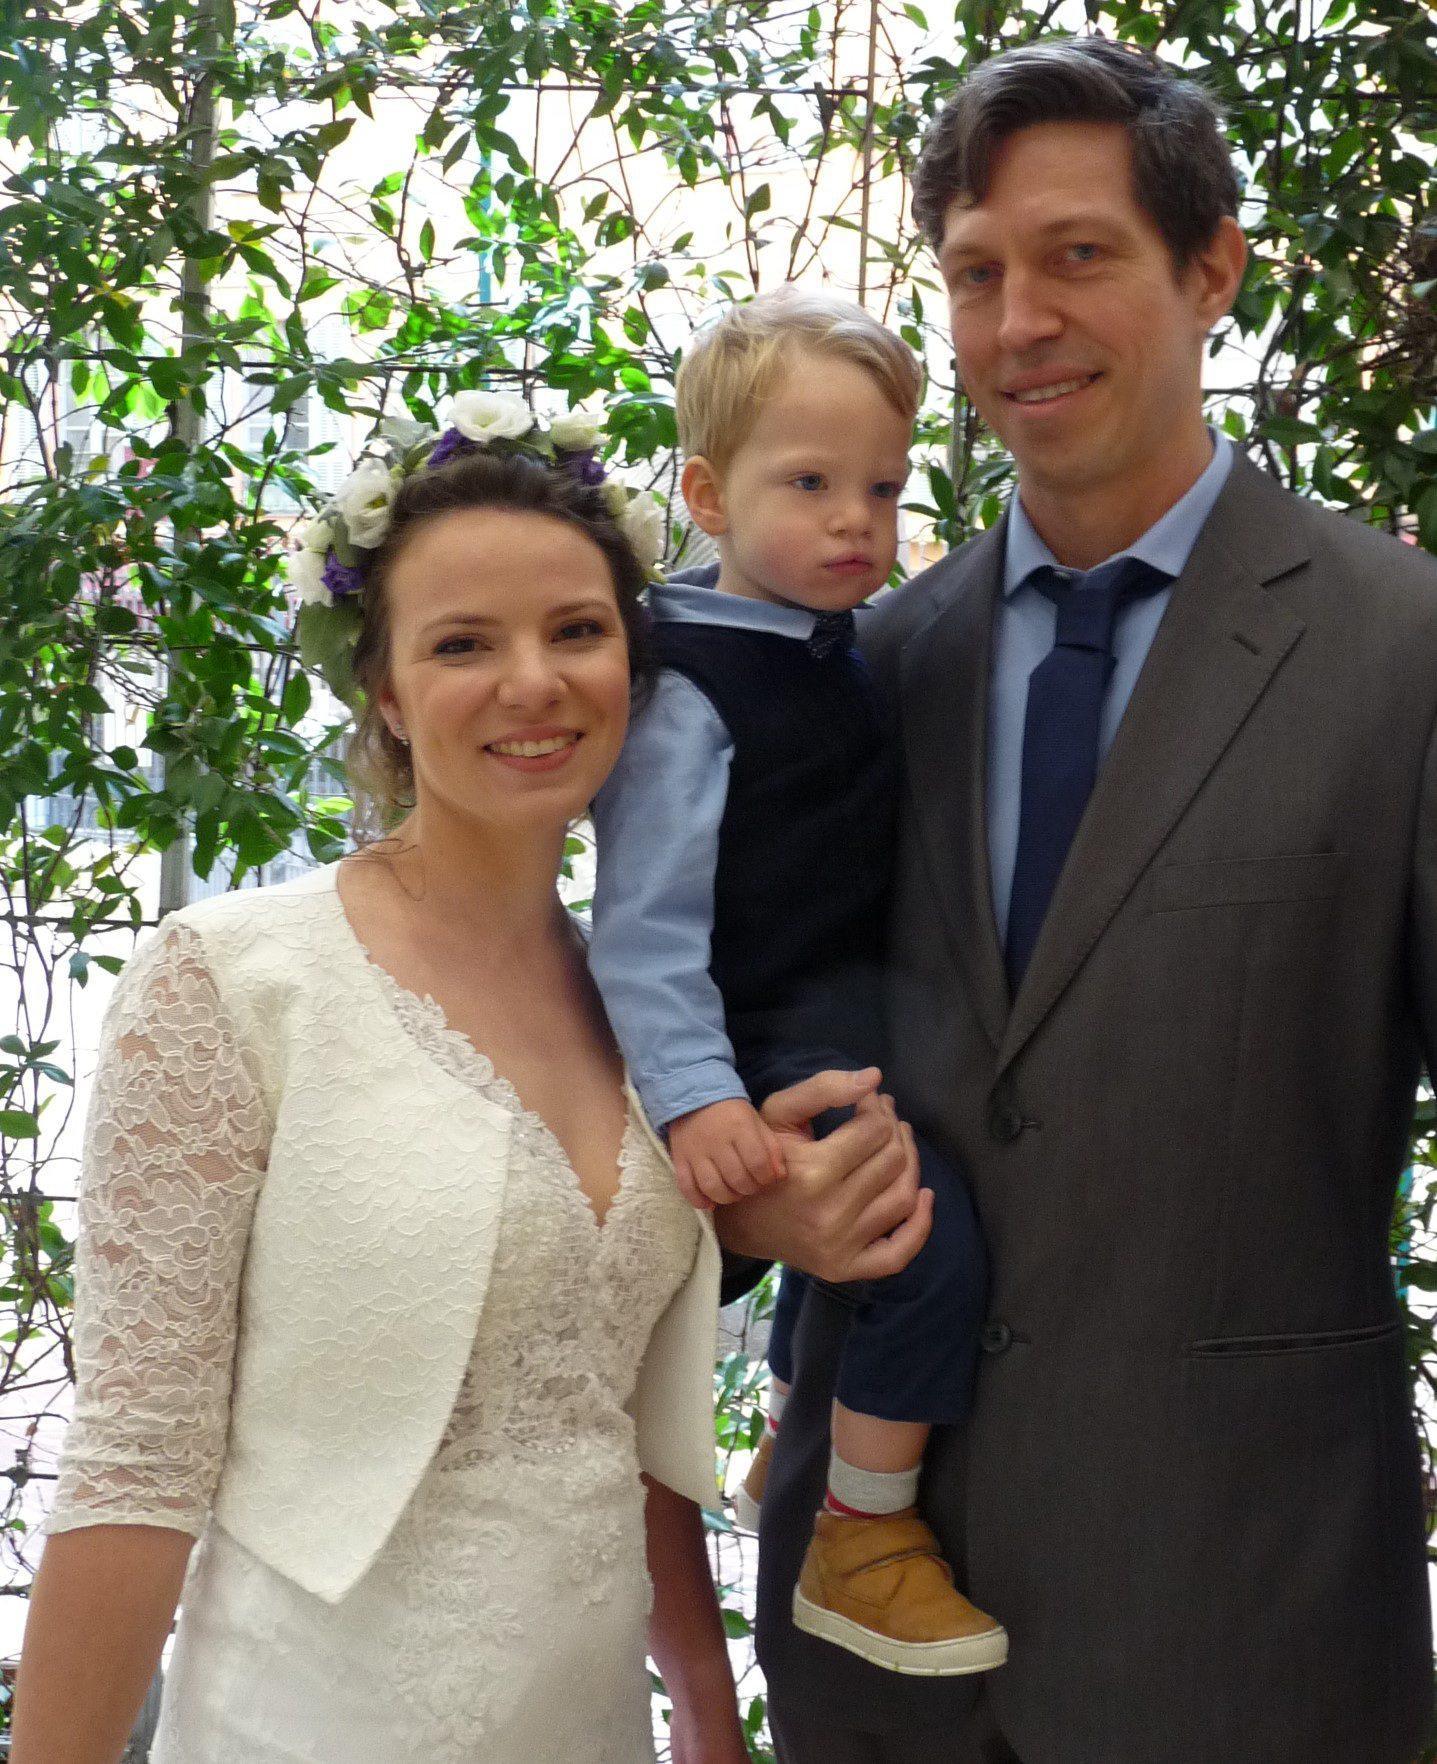 Pascal Garès Pozzo Di Borgo, comptable et Olesea Cutatcaia, mère au foyer.